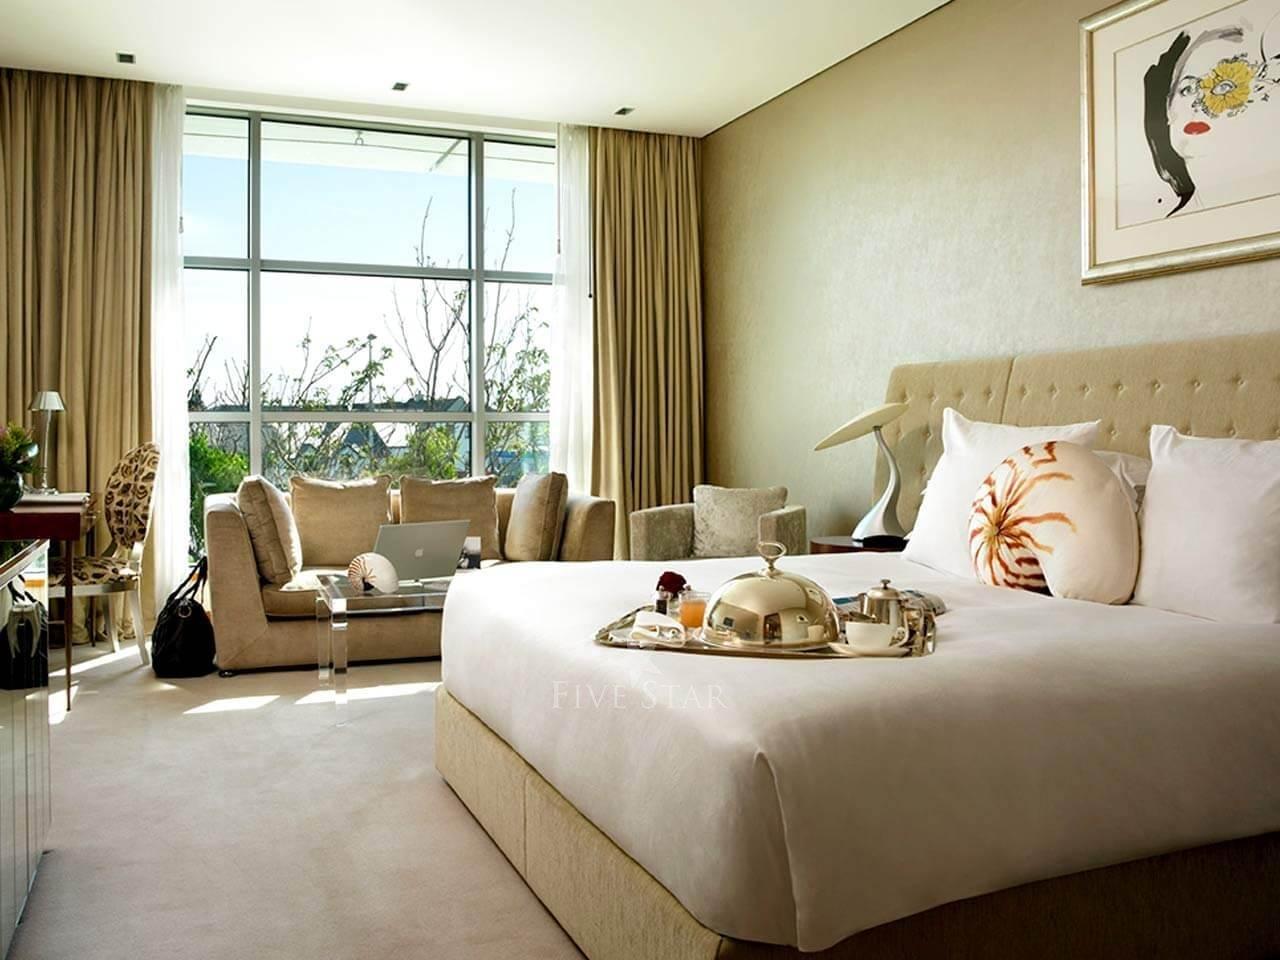 g Hotel photo 27